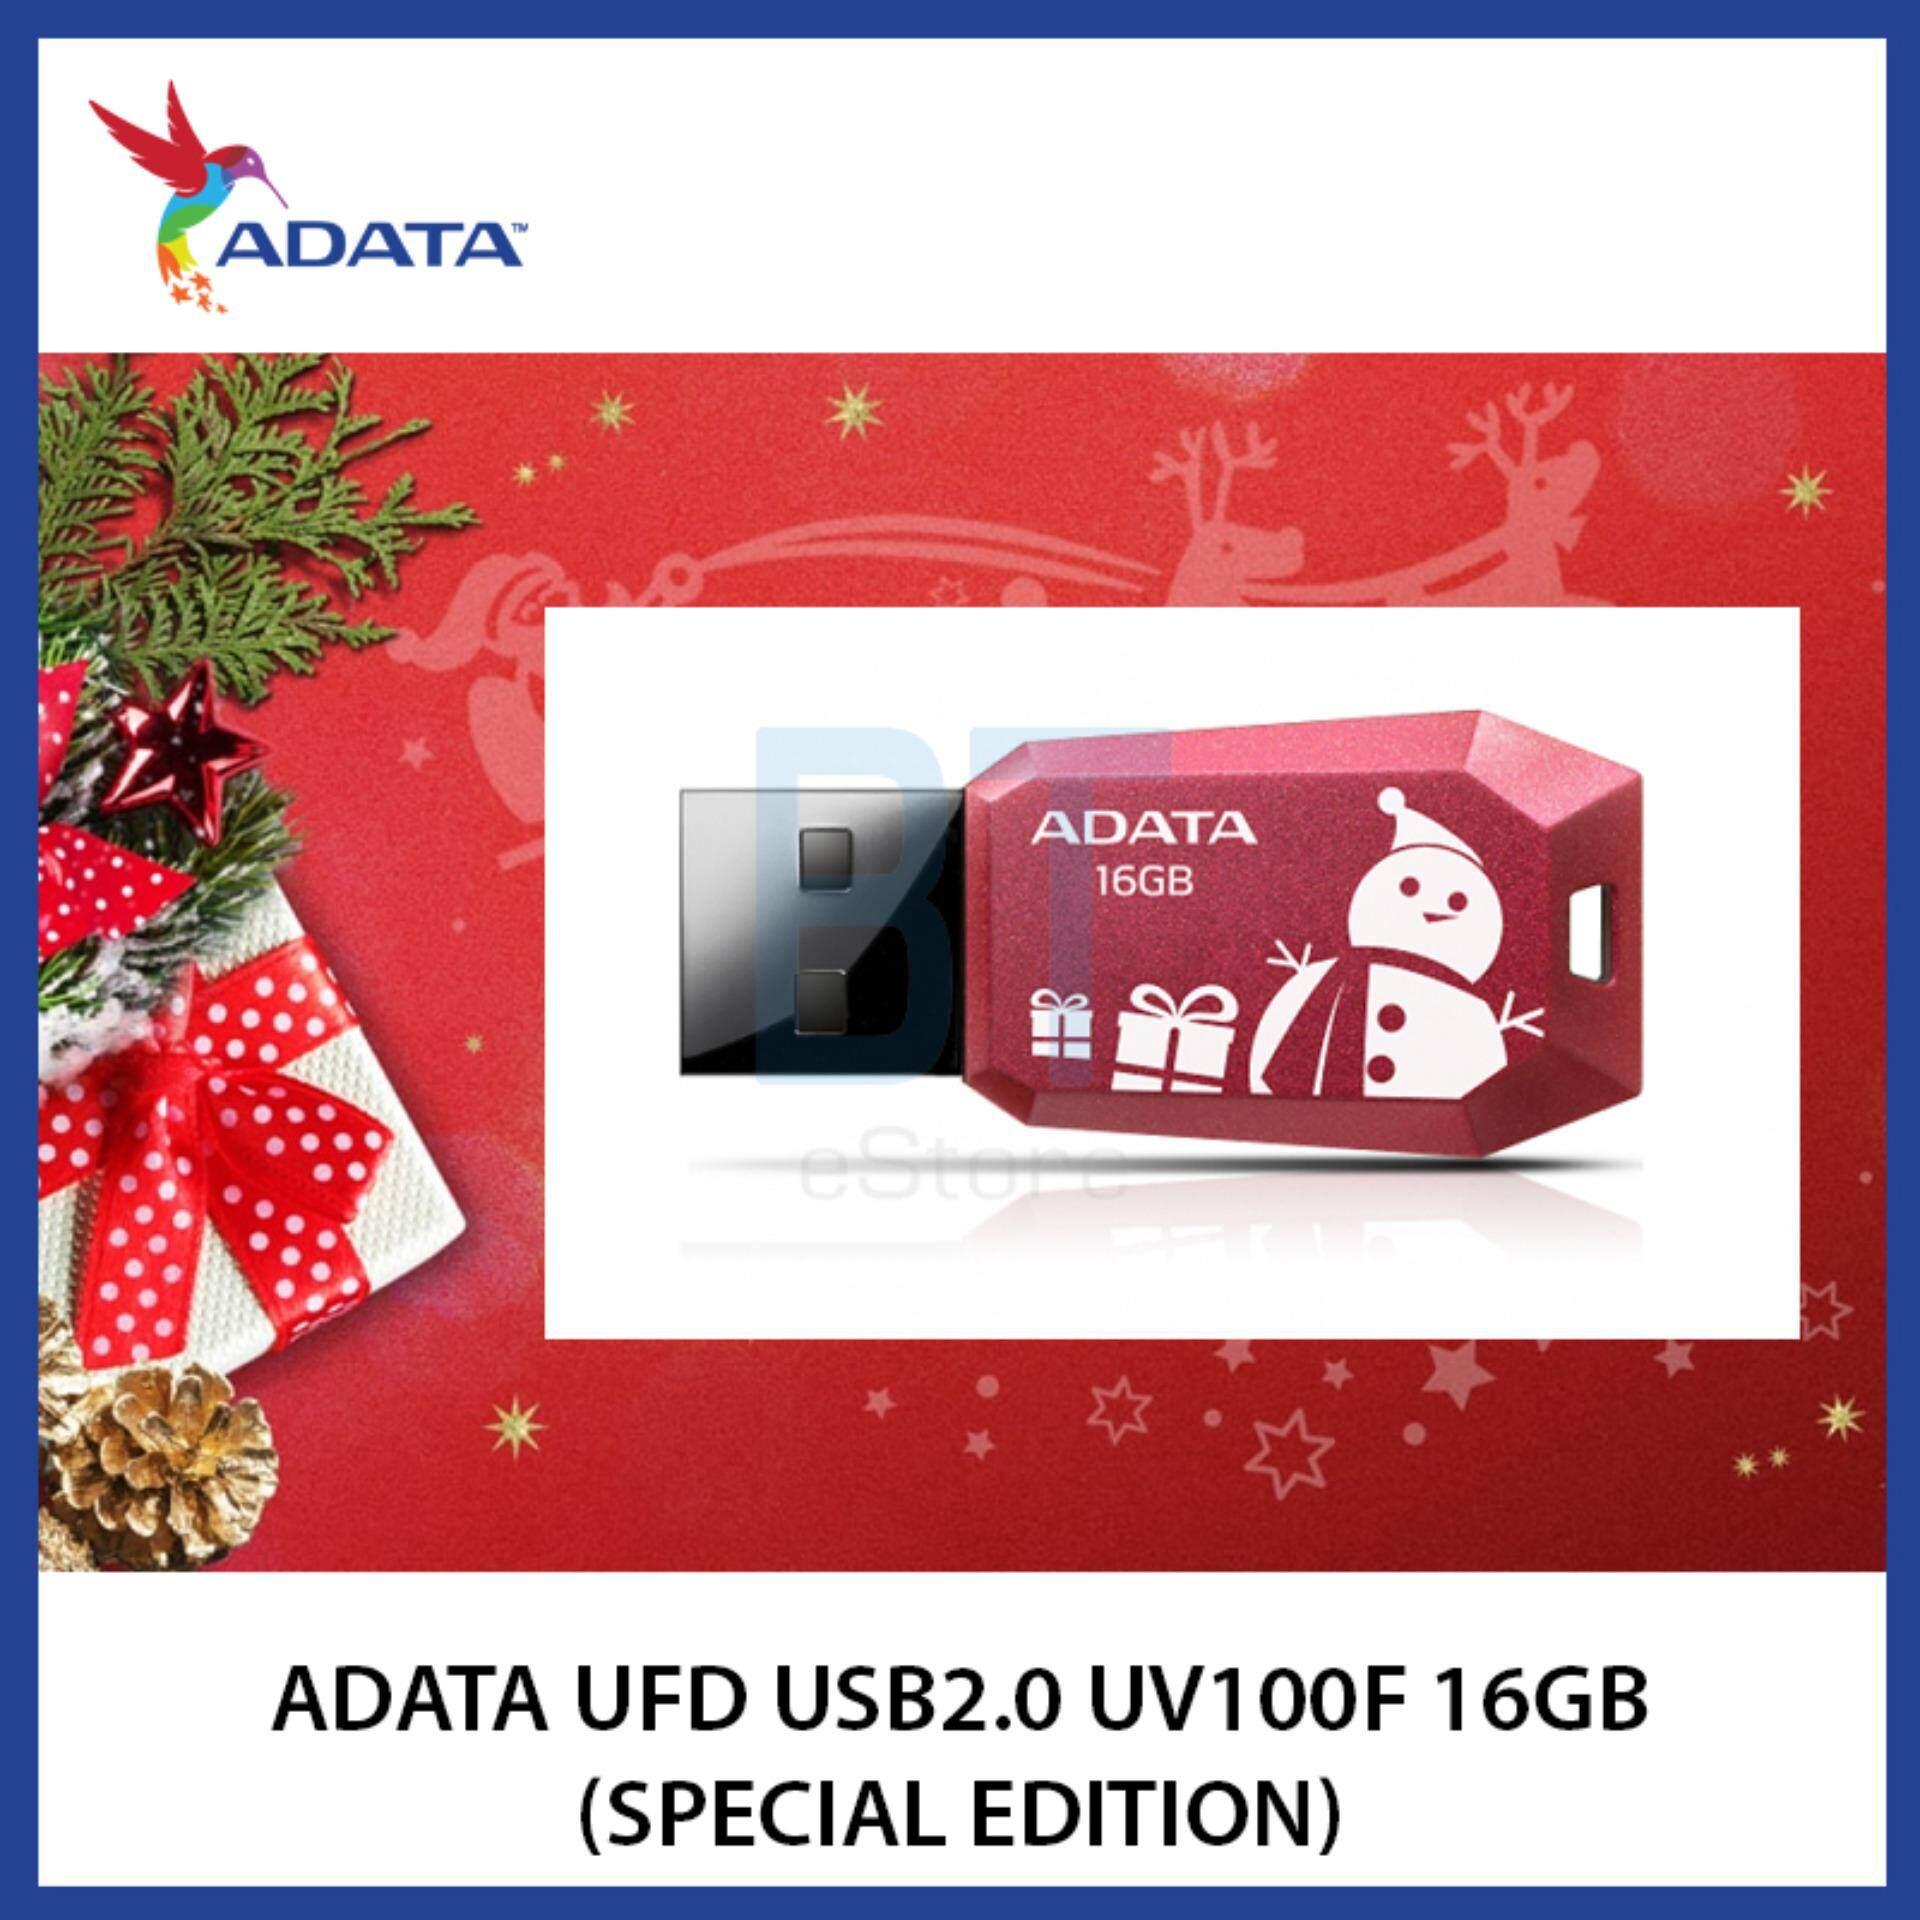 AData UFD USB2.0 UV100F 16GB (X'mas Special Edition)